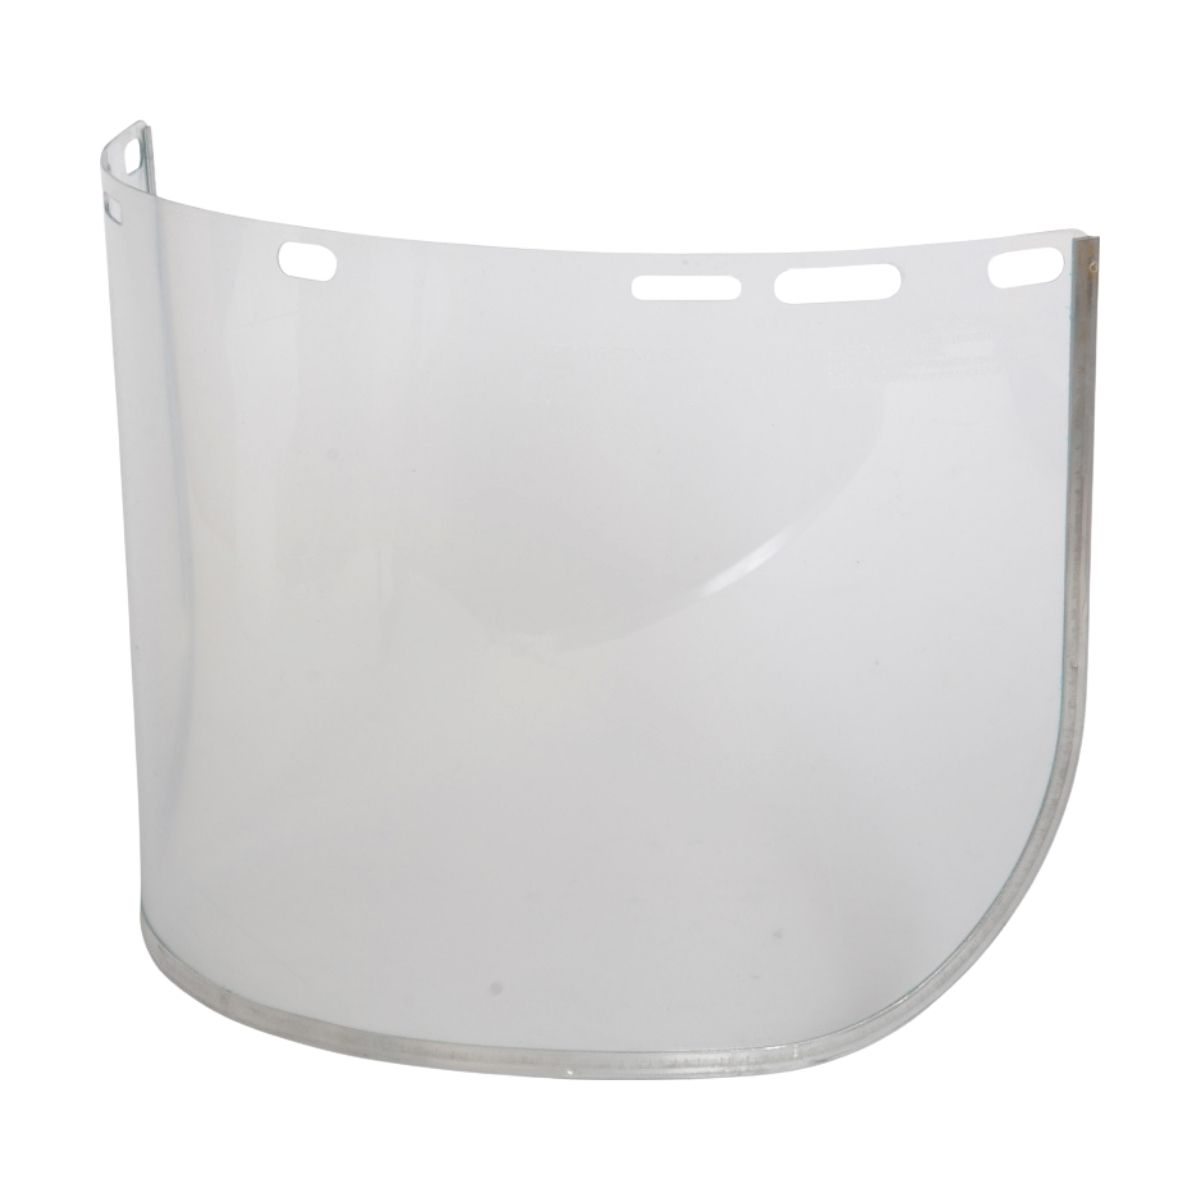 HF0200 Polycarbonate Visor for Yellow Browguard